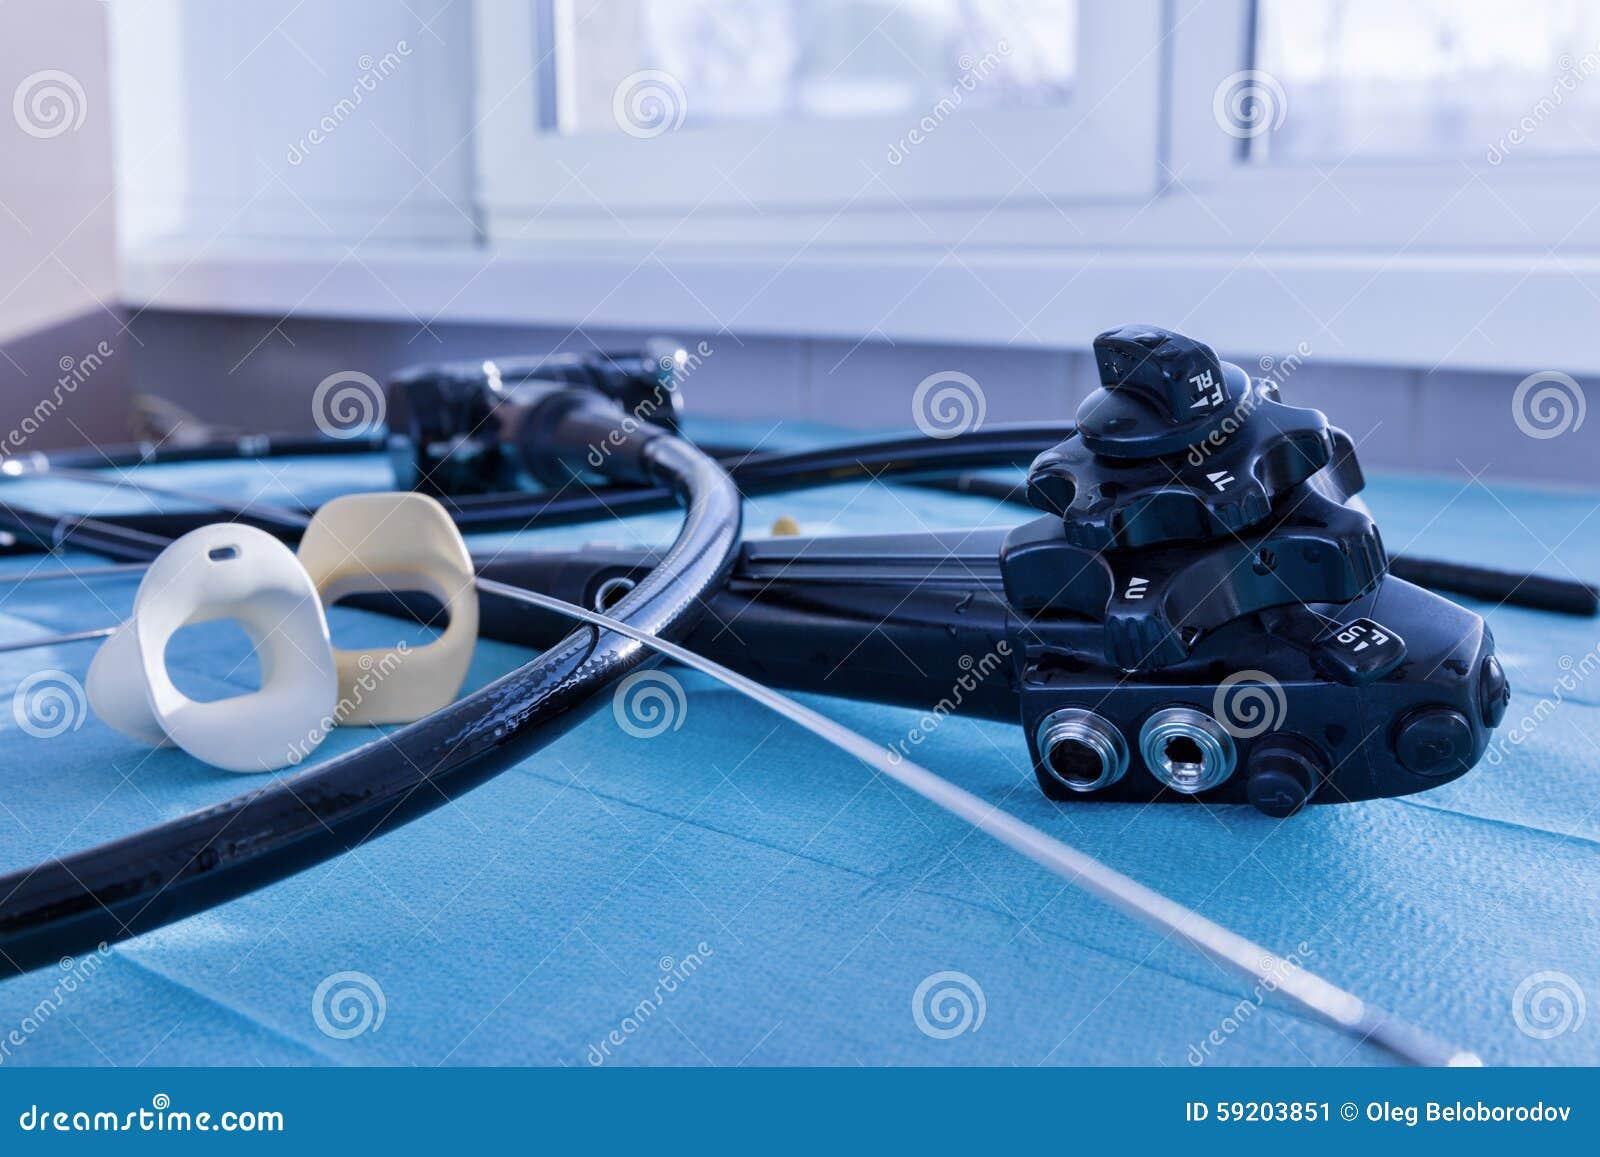 The endoscope